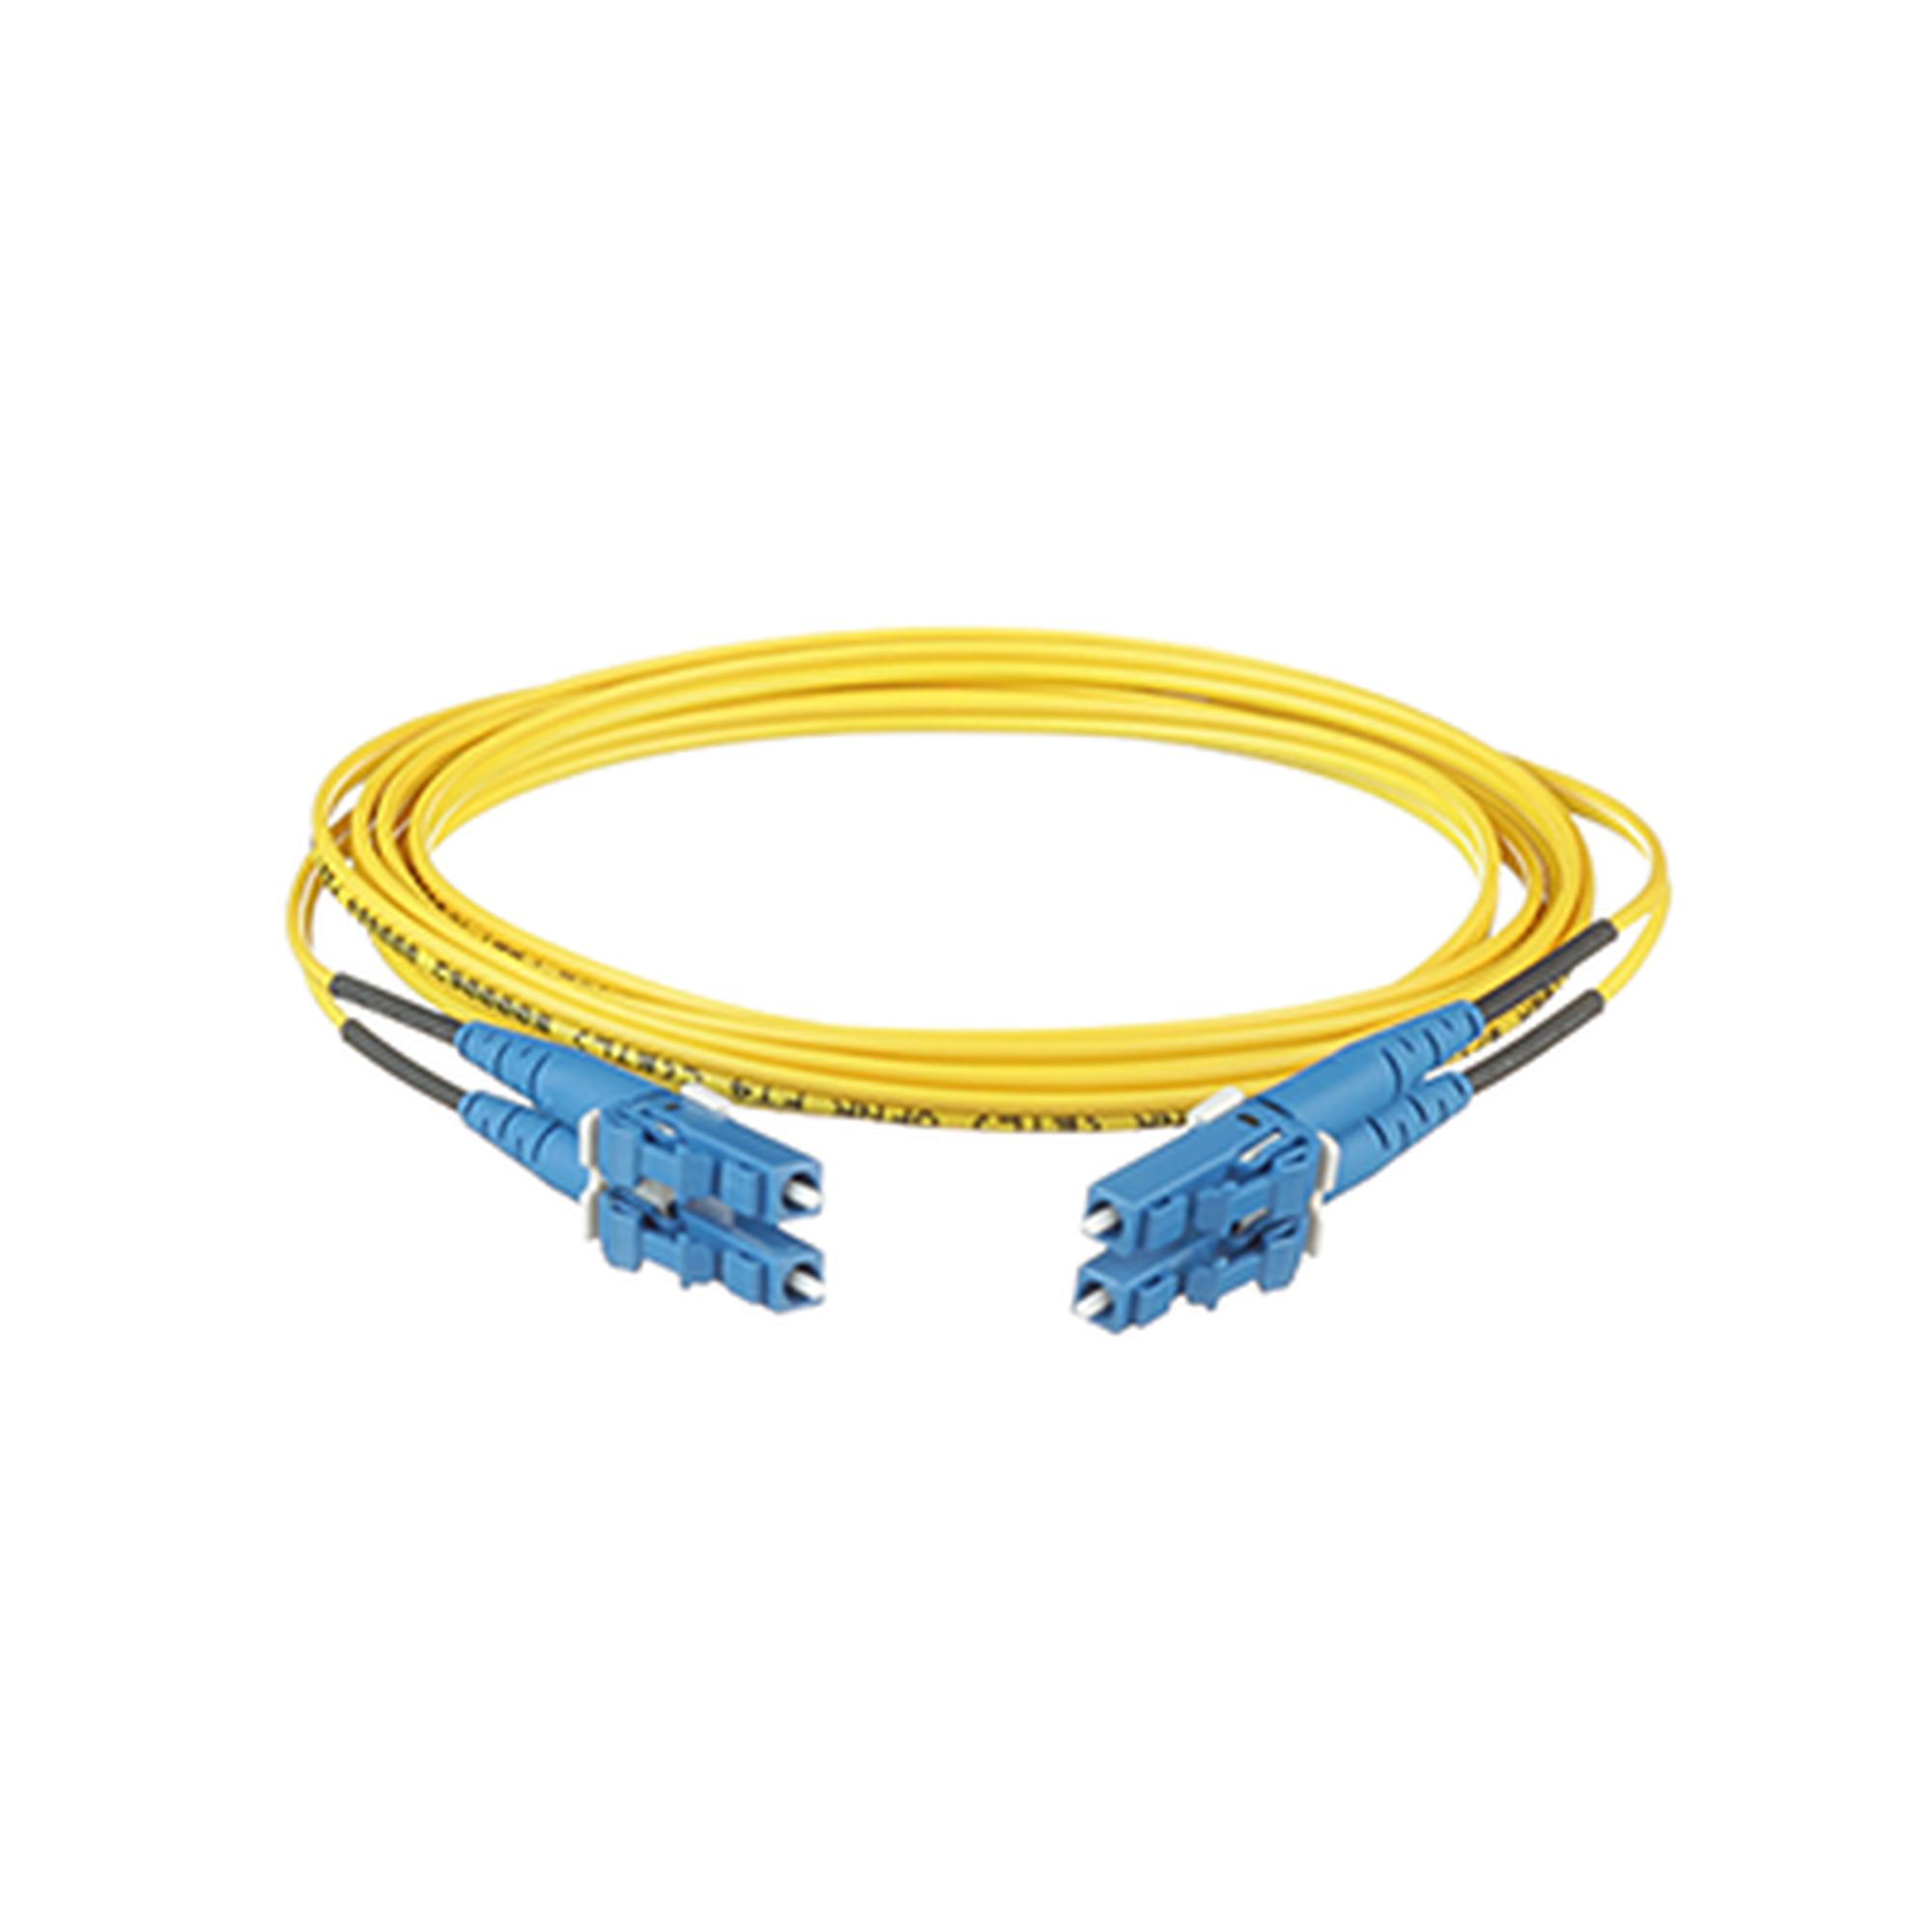 Jumper de Fibra Optica Monomodo 9/125 OS2, LC-LC Duplex, OFNR (Riser), Color Amarillo, 1 Metro